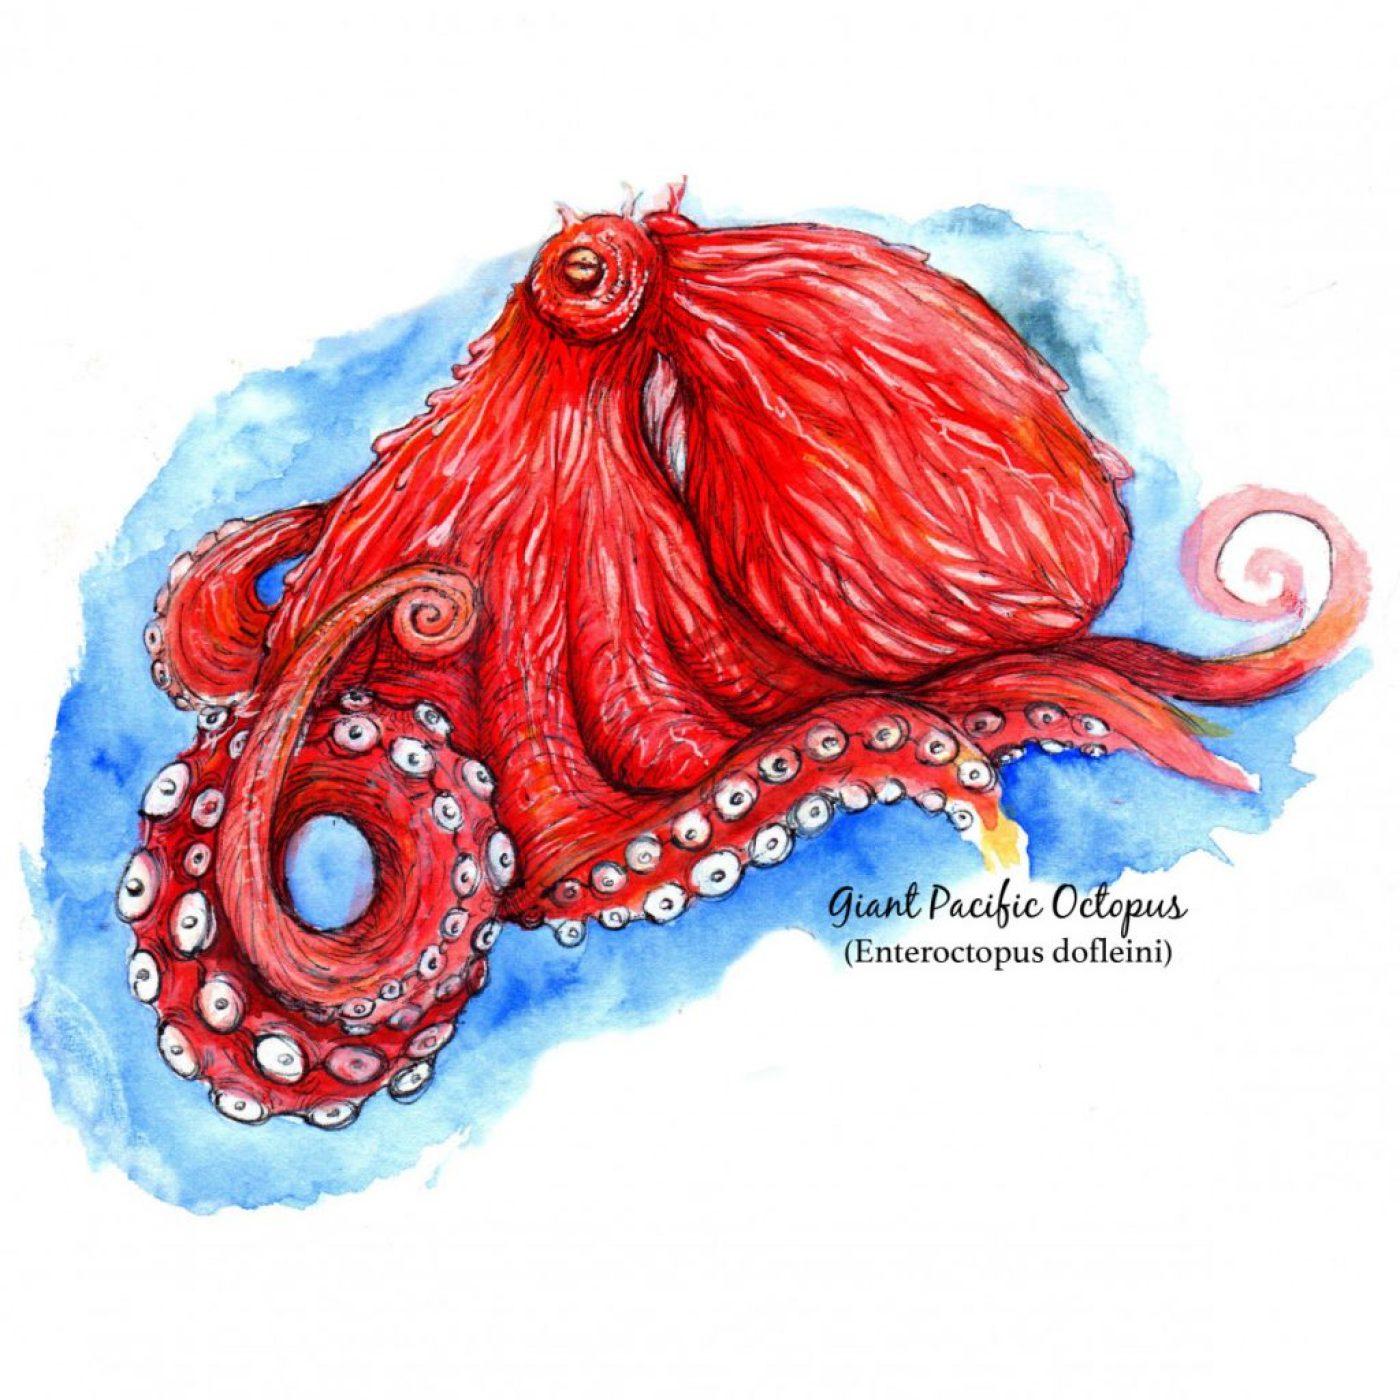 Tacoma narrows octopus 1